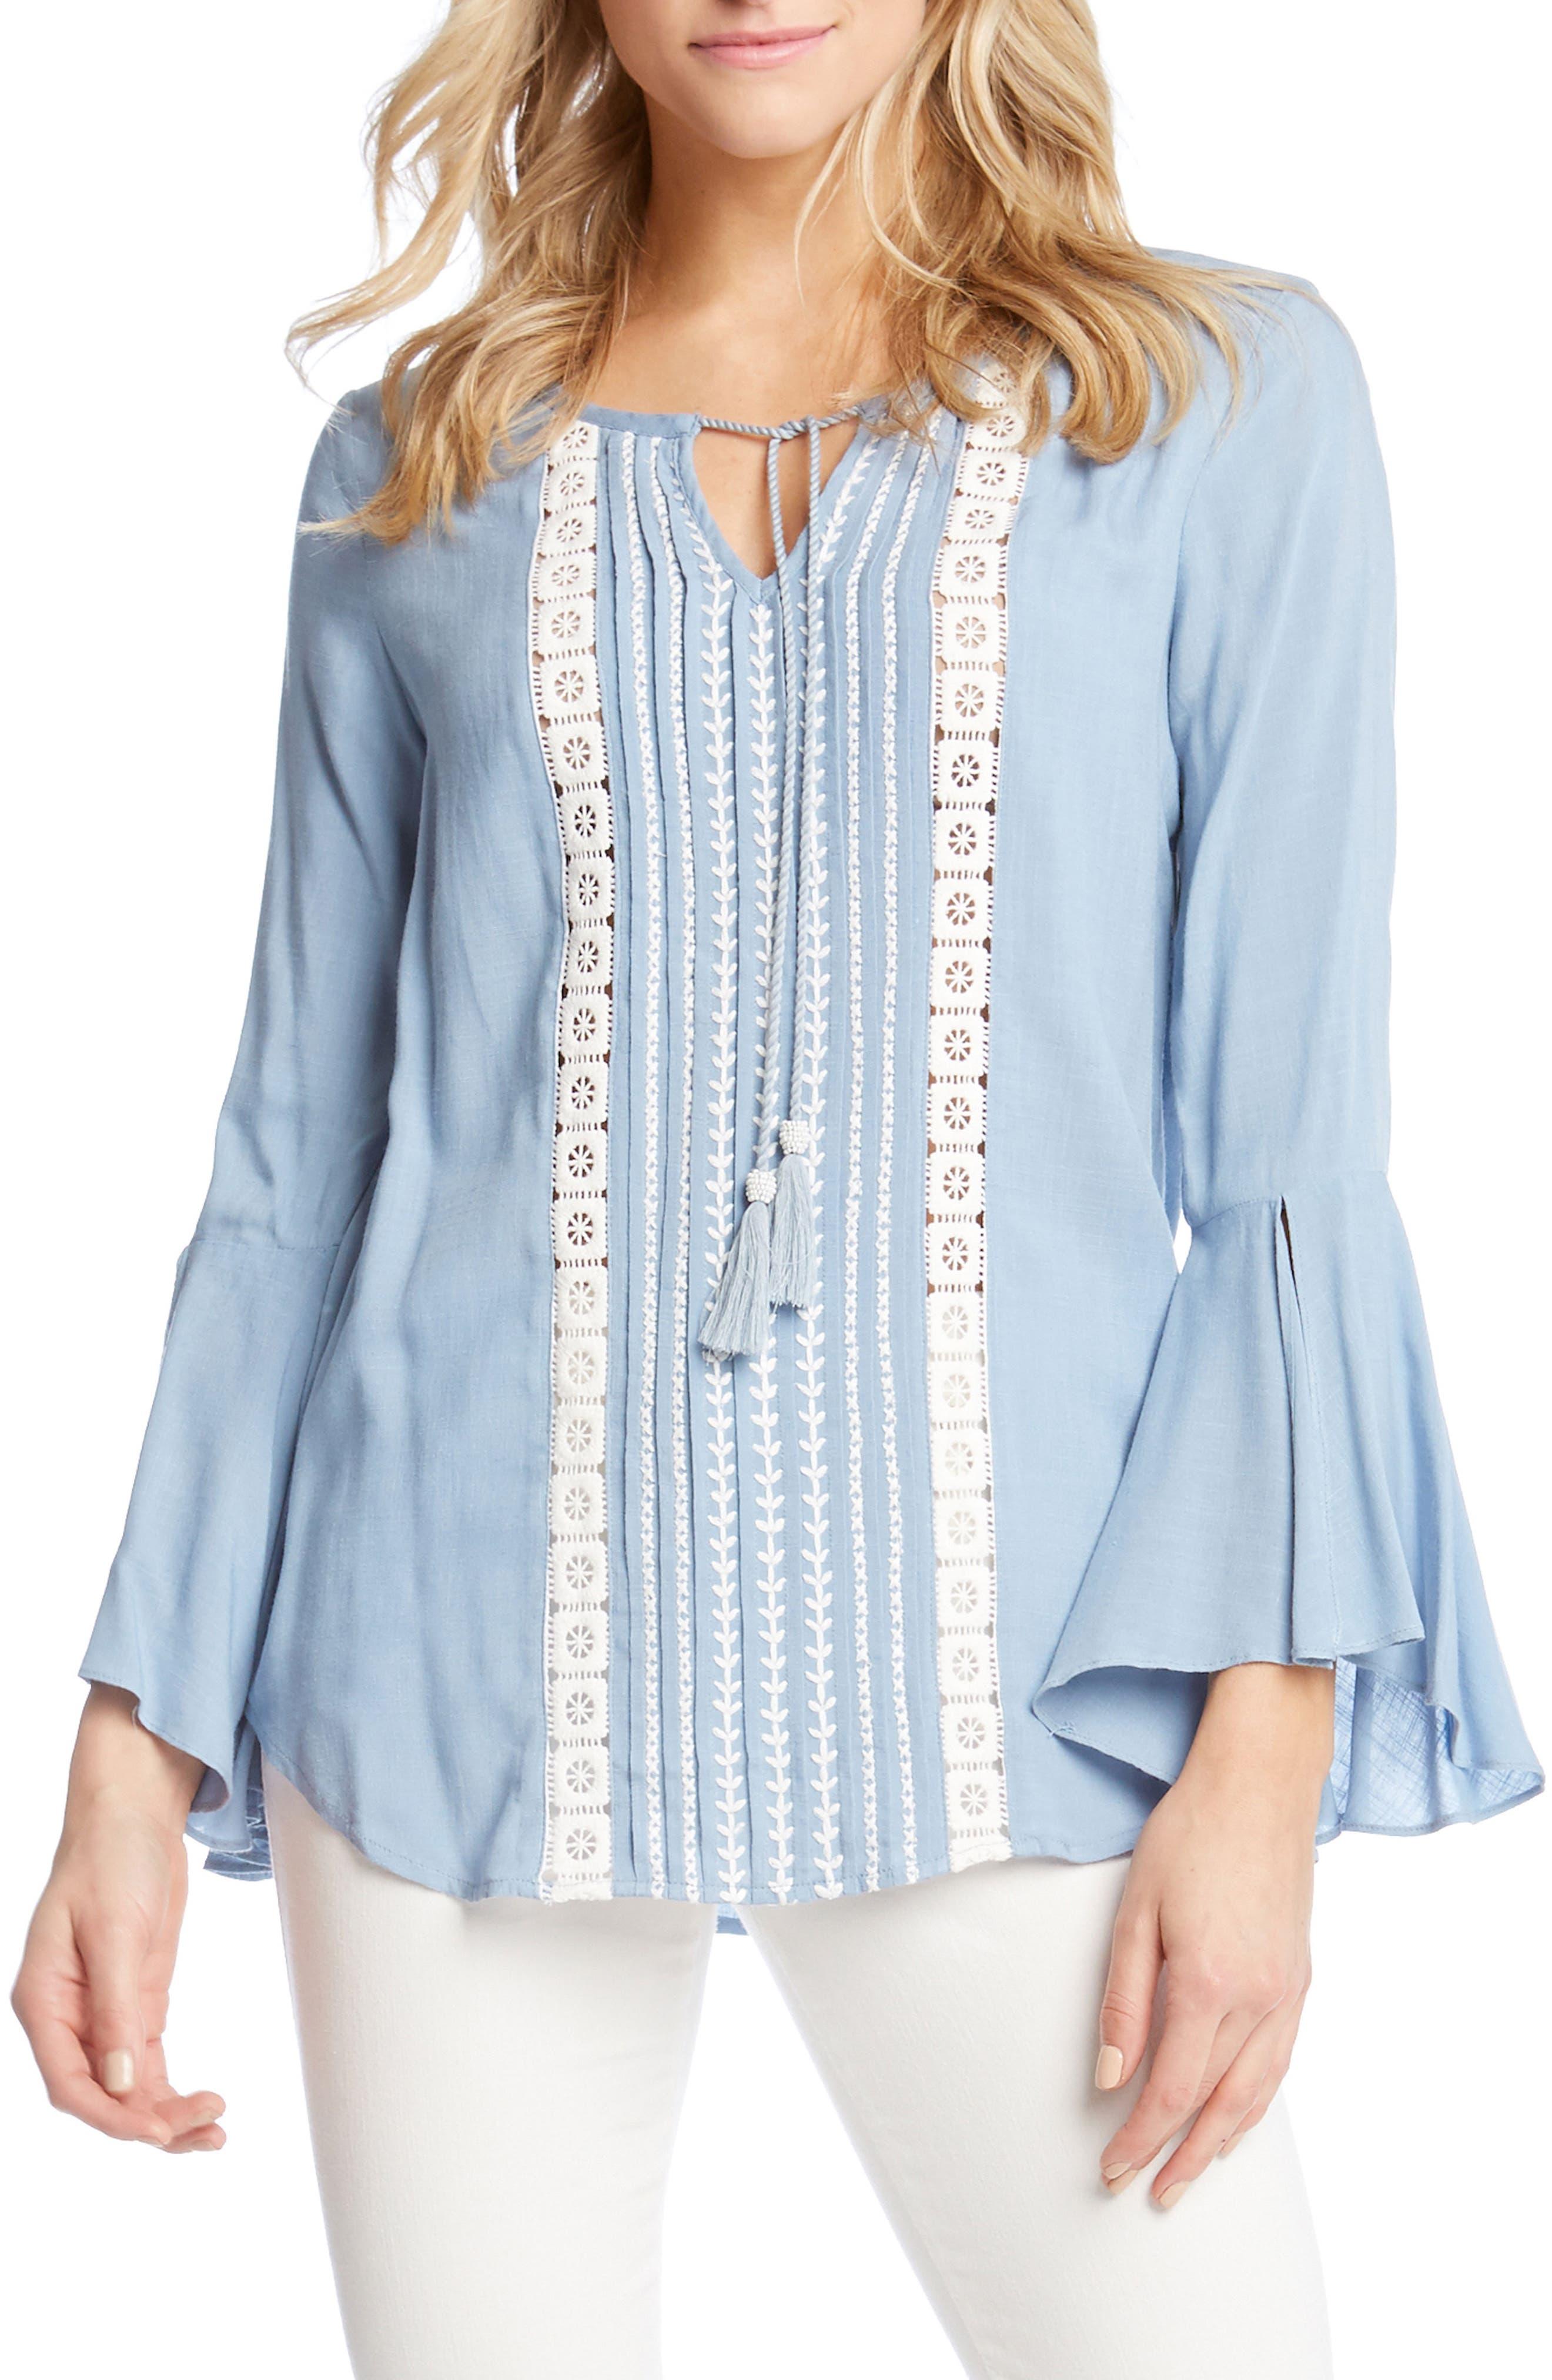 Main Image - Karen Kane Embroidered Split Sleeve Top